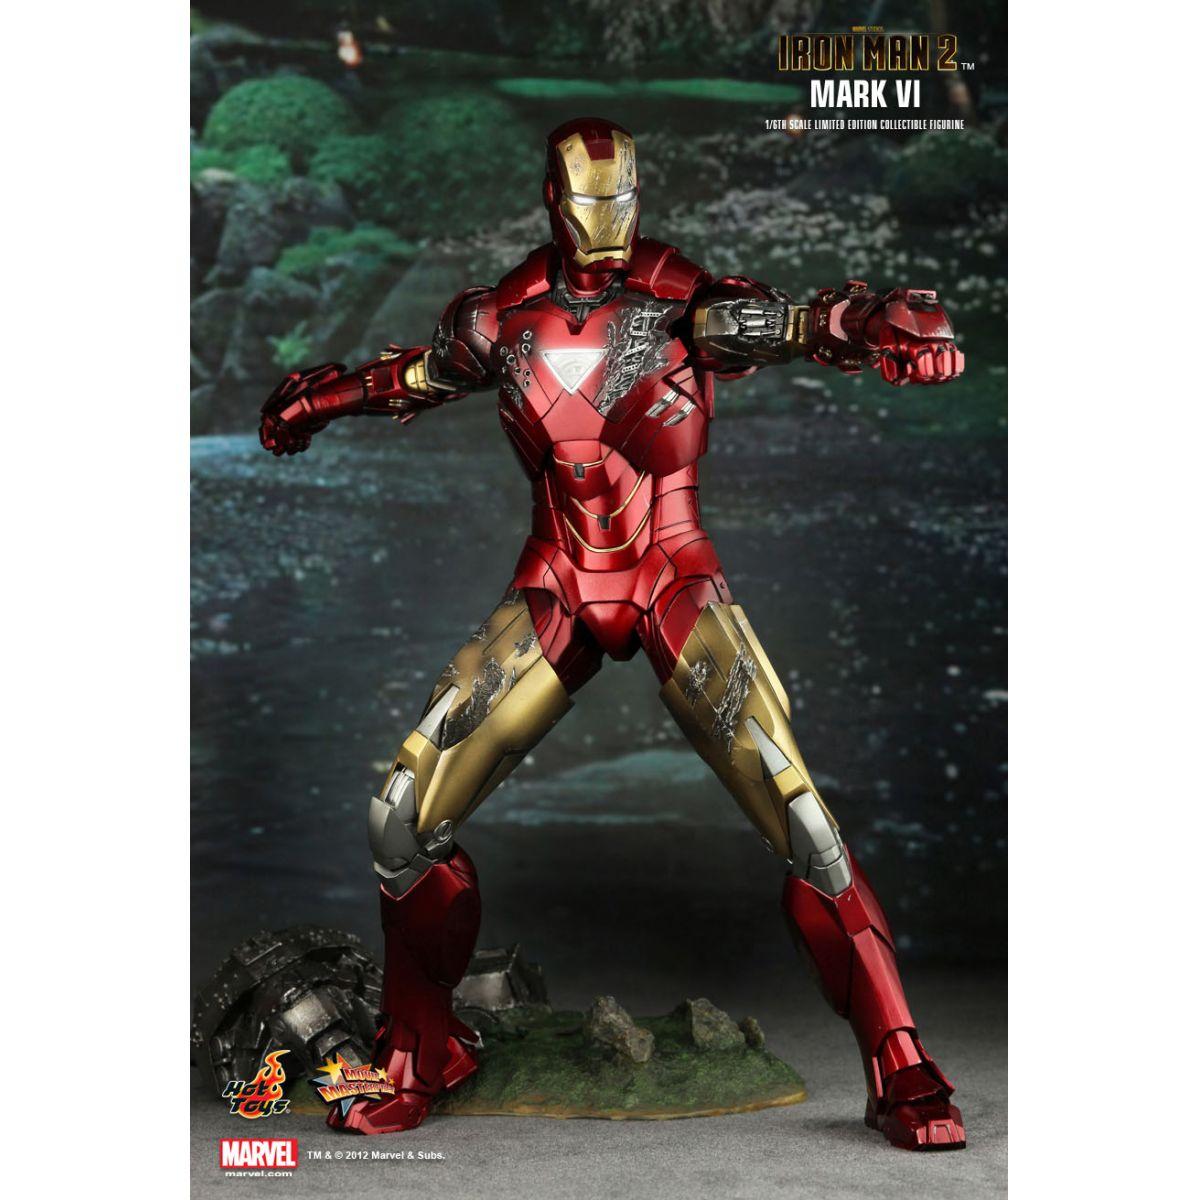 Action Figure Homem de Ferro (Iron Man) Mark VI: Homem de Ferro 2 (Iron Man 2) MMS132 (Escala 1/6) - Hot Toys - CDL